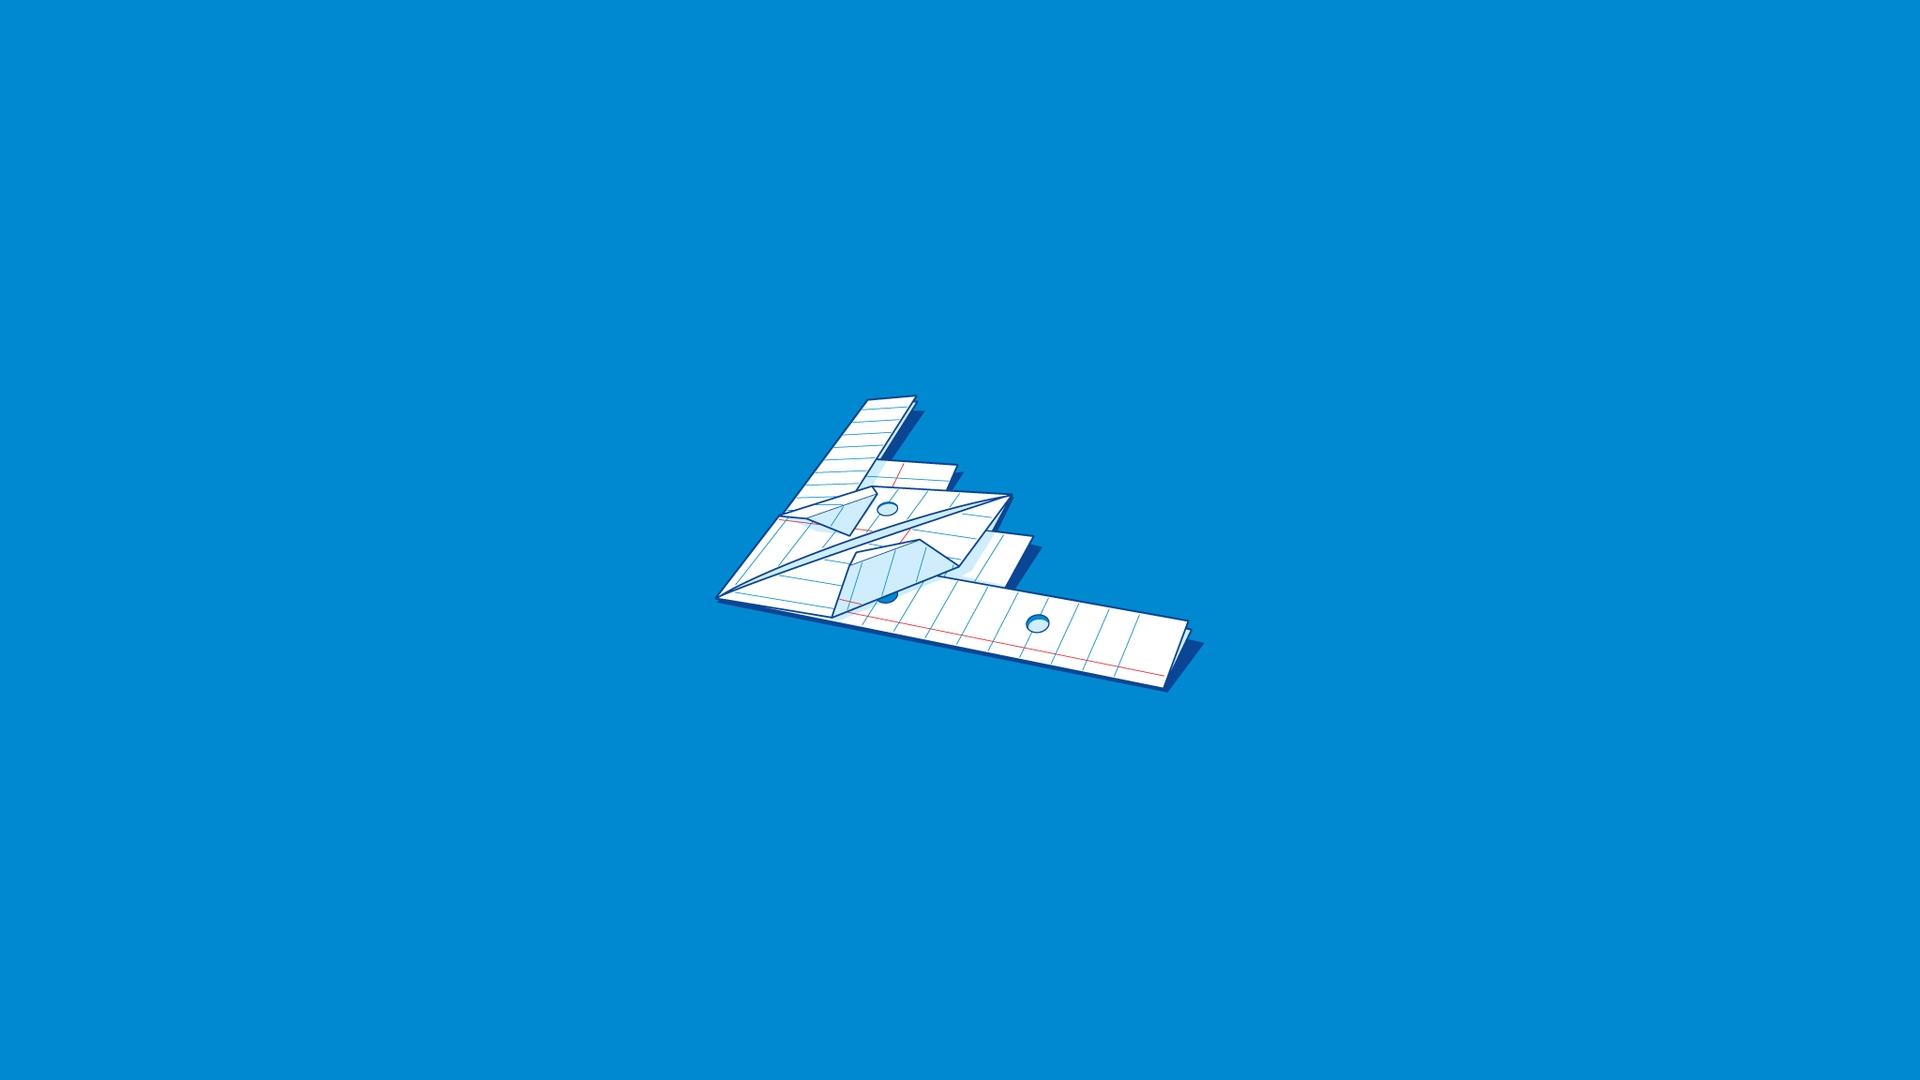 Wallpaper Iphone Pastel 5 Fantastic Hd Paper Airplane Wallpapers